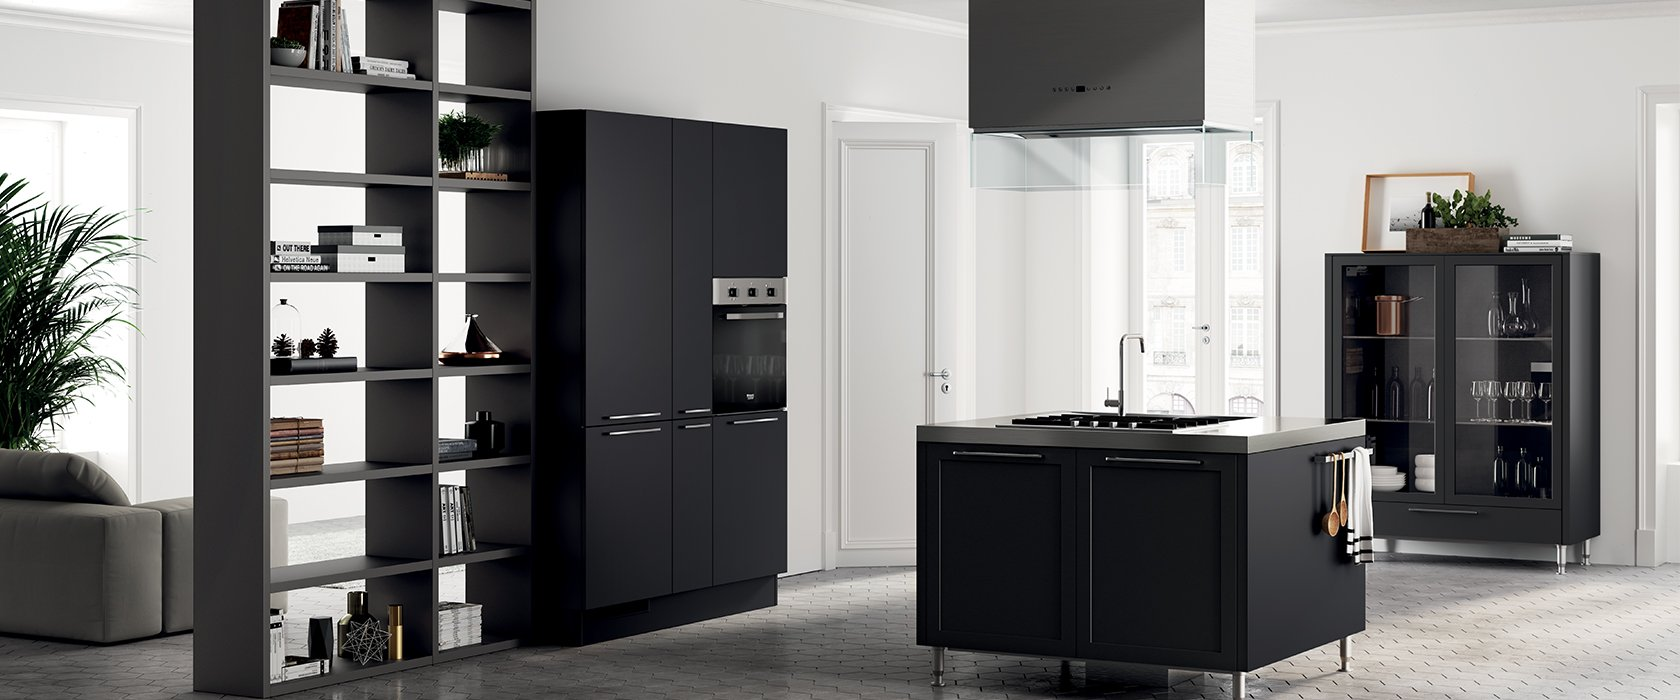 cucina Scavolini nera